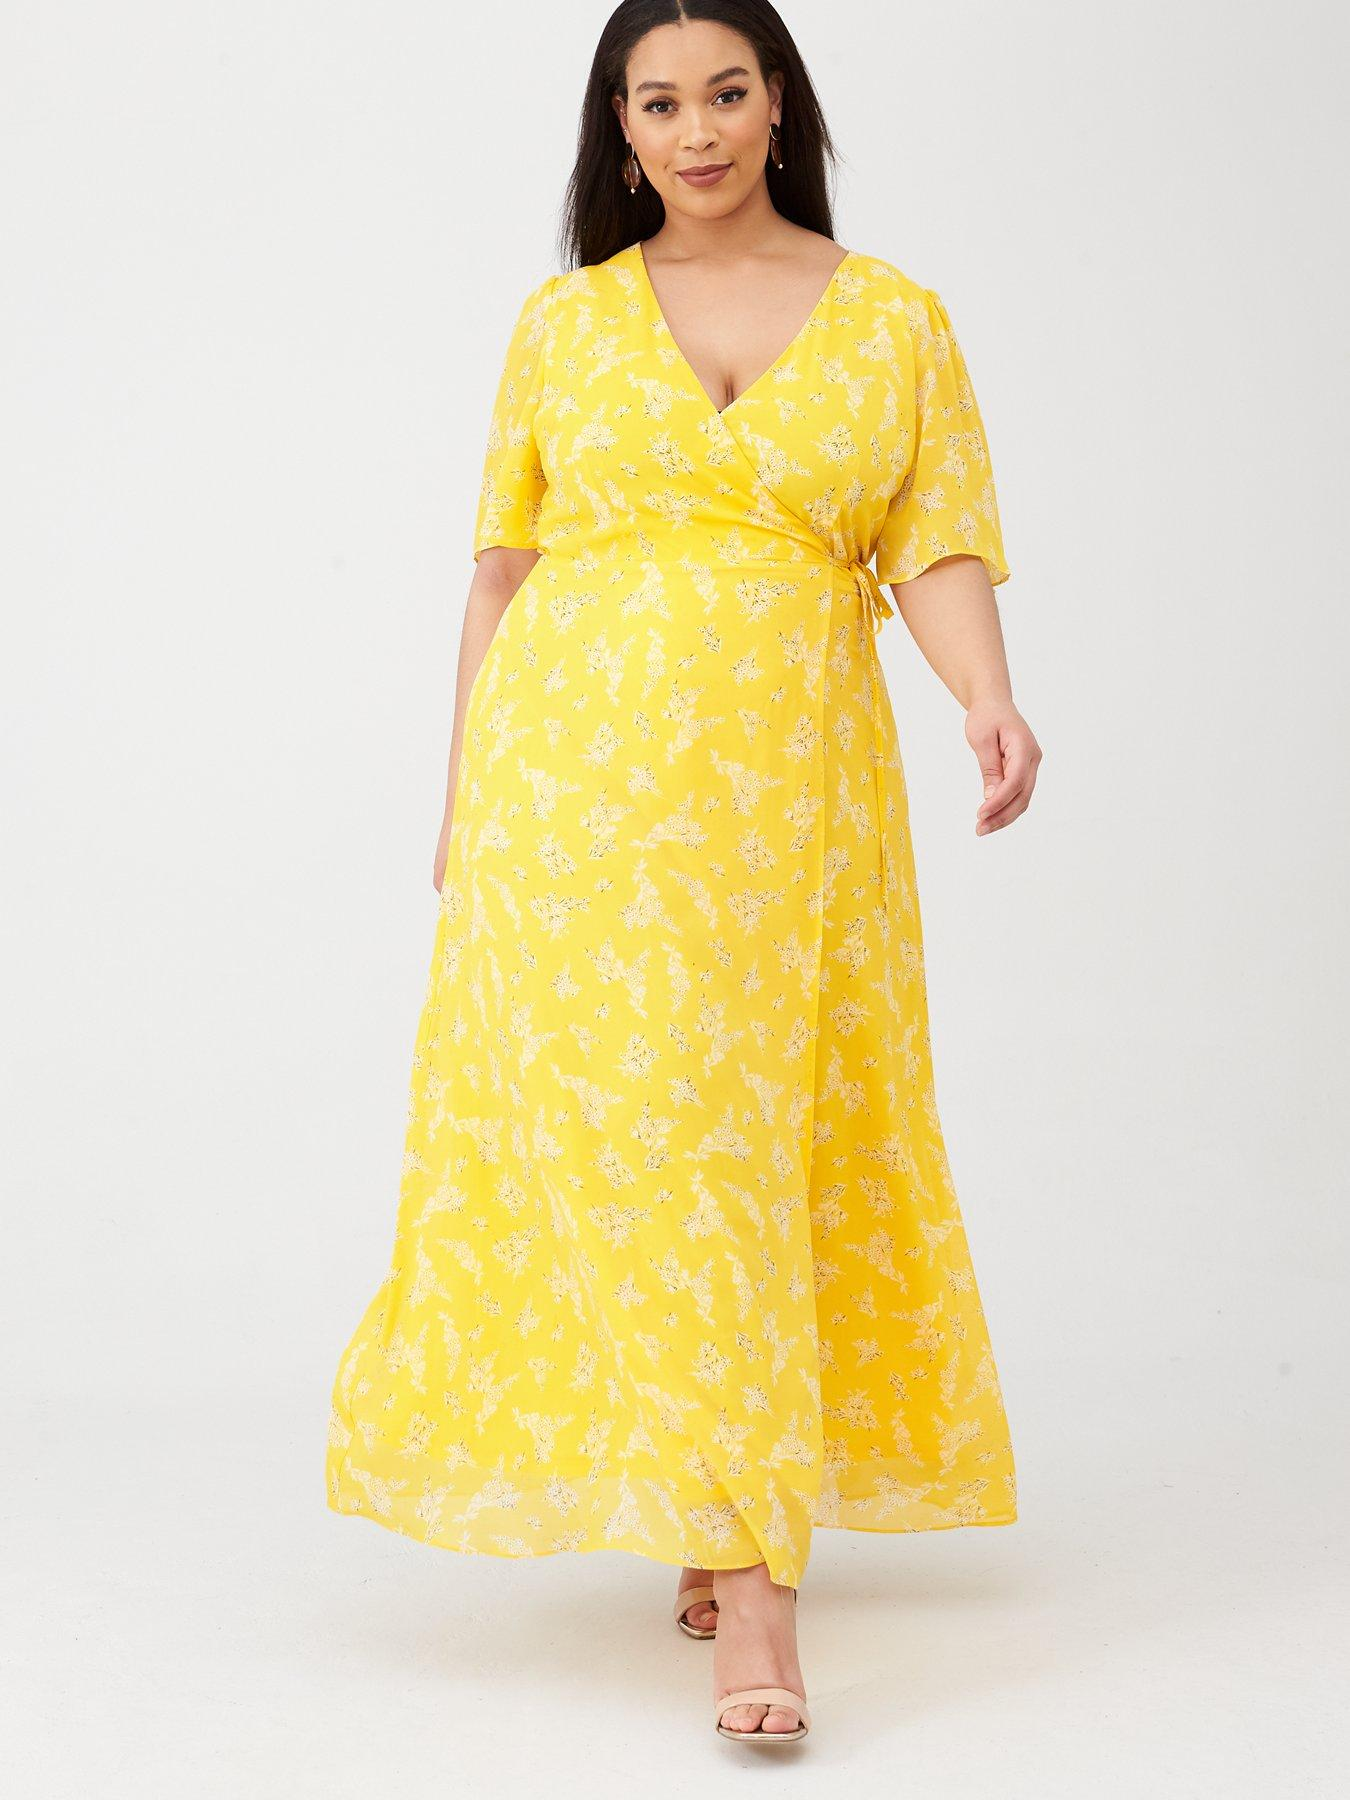 Hobbs Farrah Soft Lemon Dress Various Sizes RRP £139.